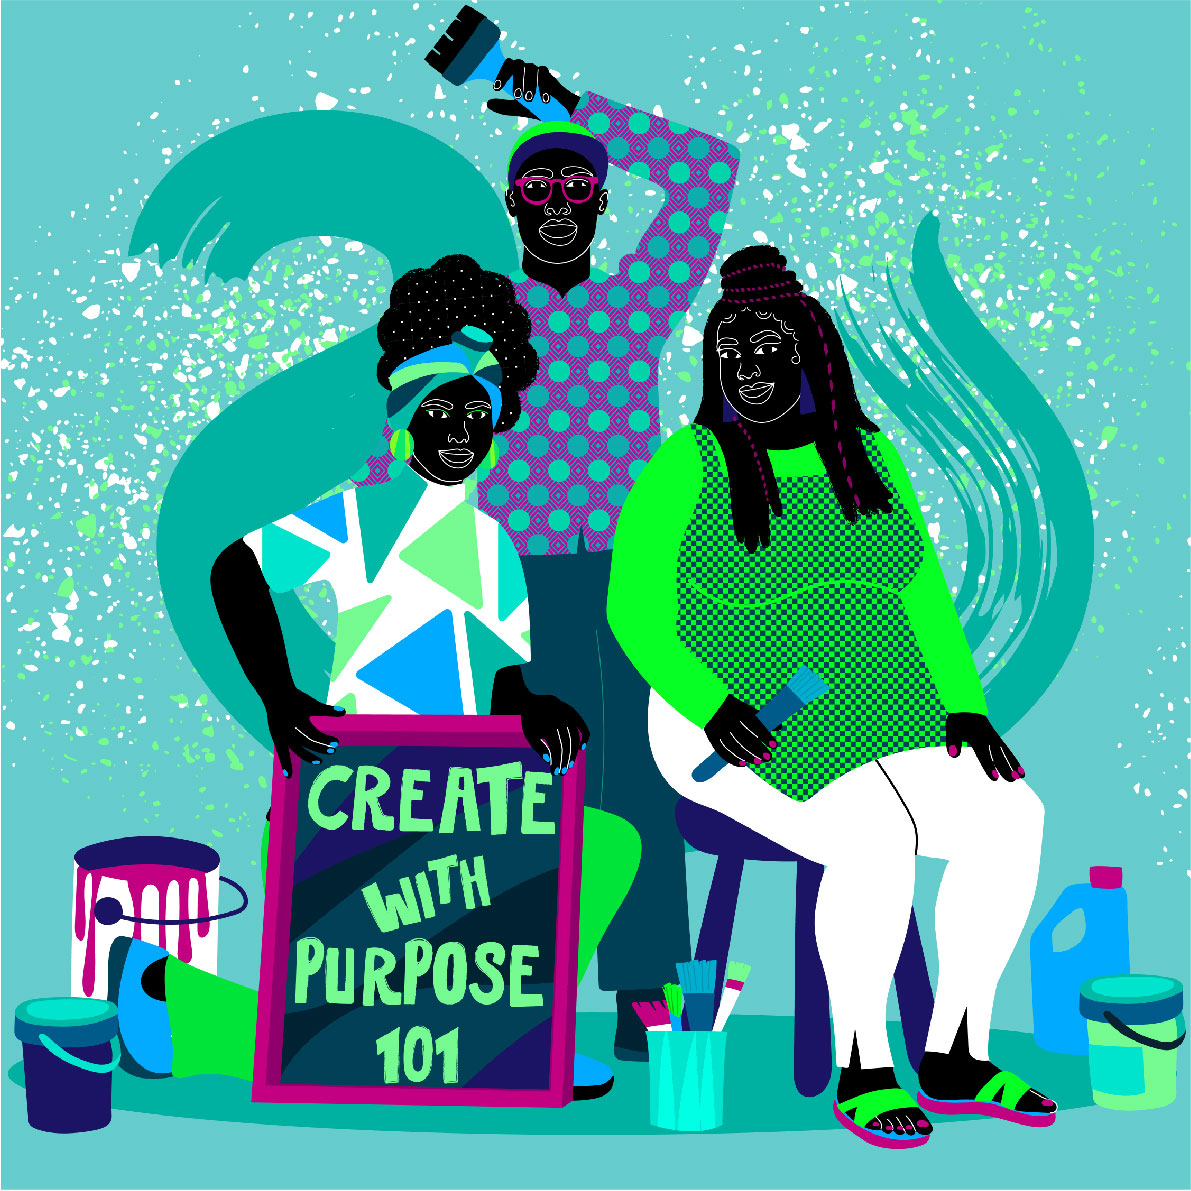 black, group of people, artist, creativity, skillshare, blue, green, man, women